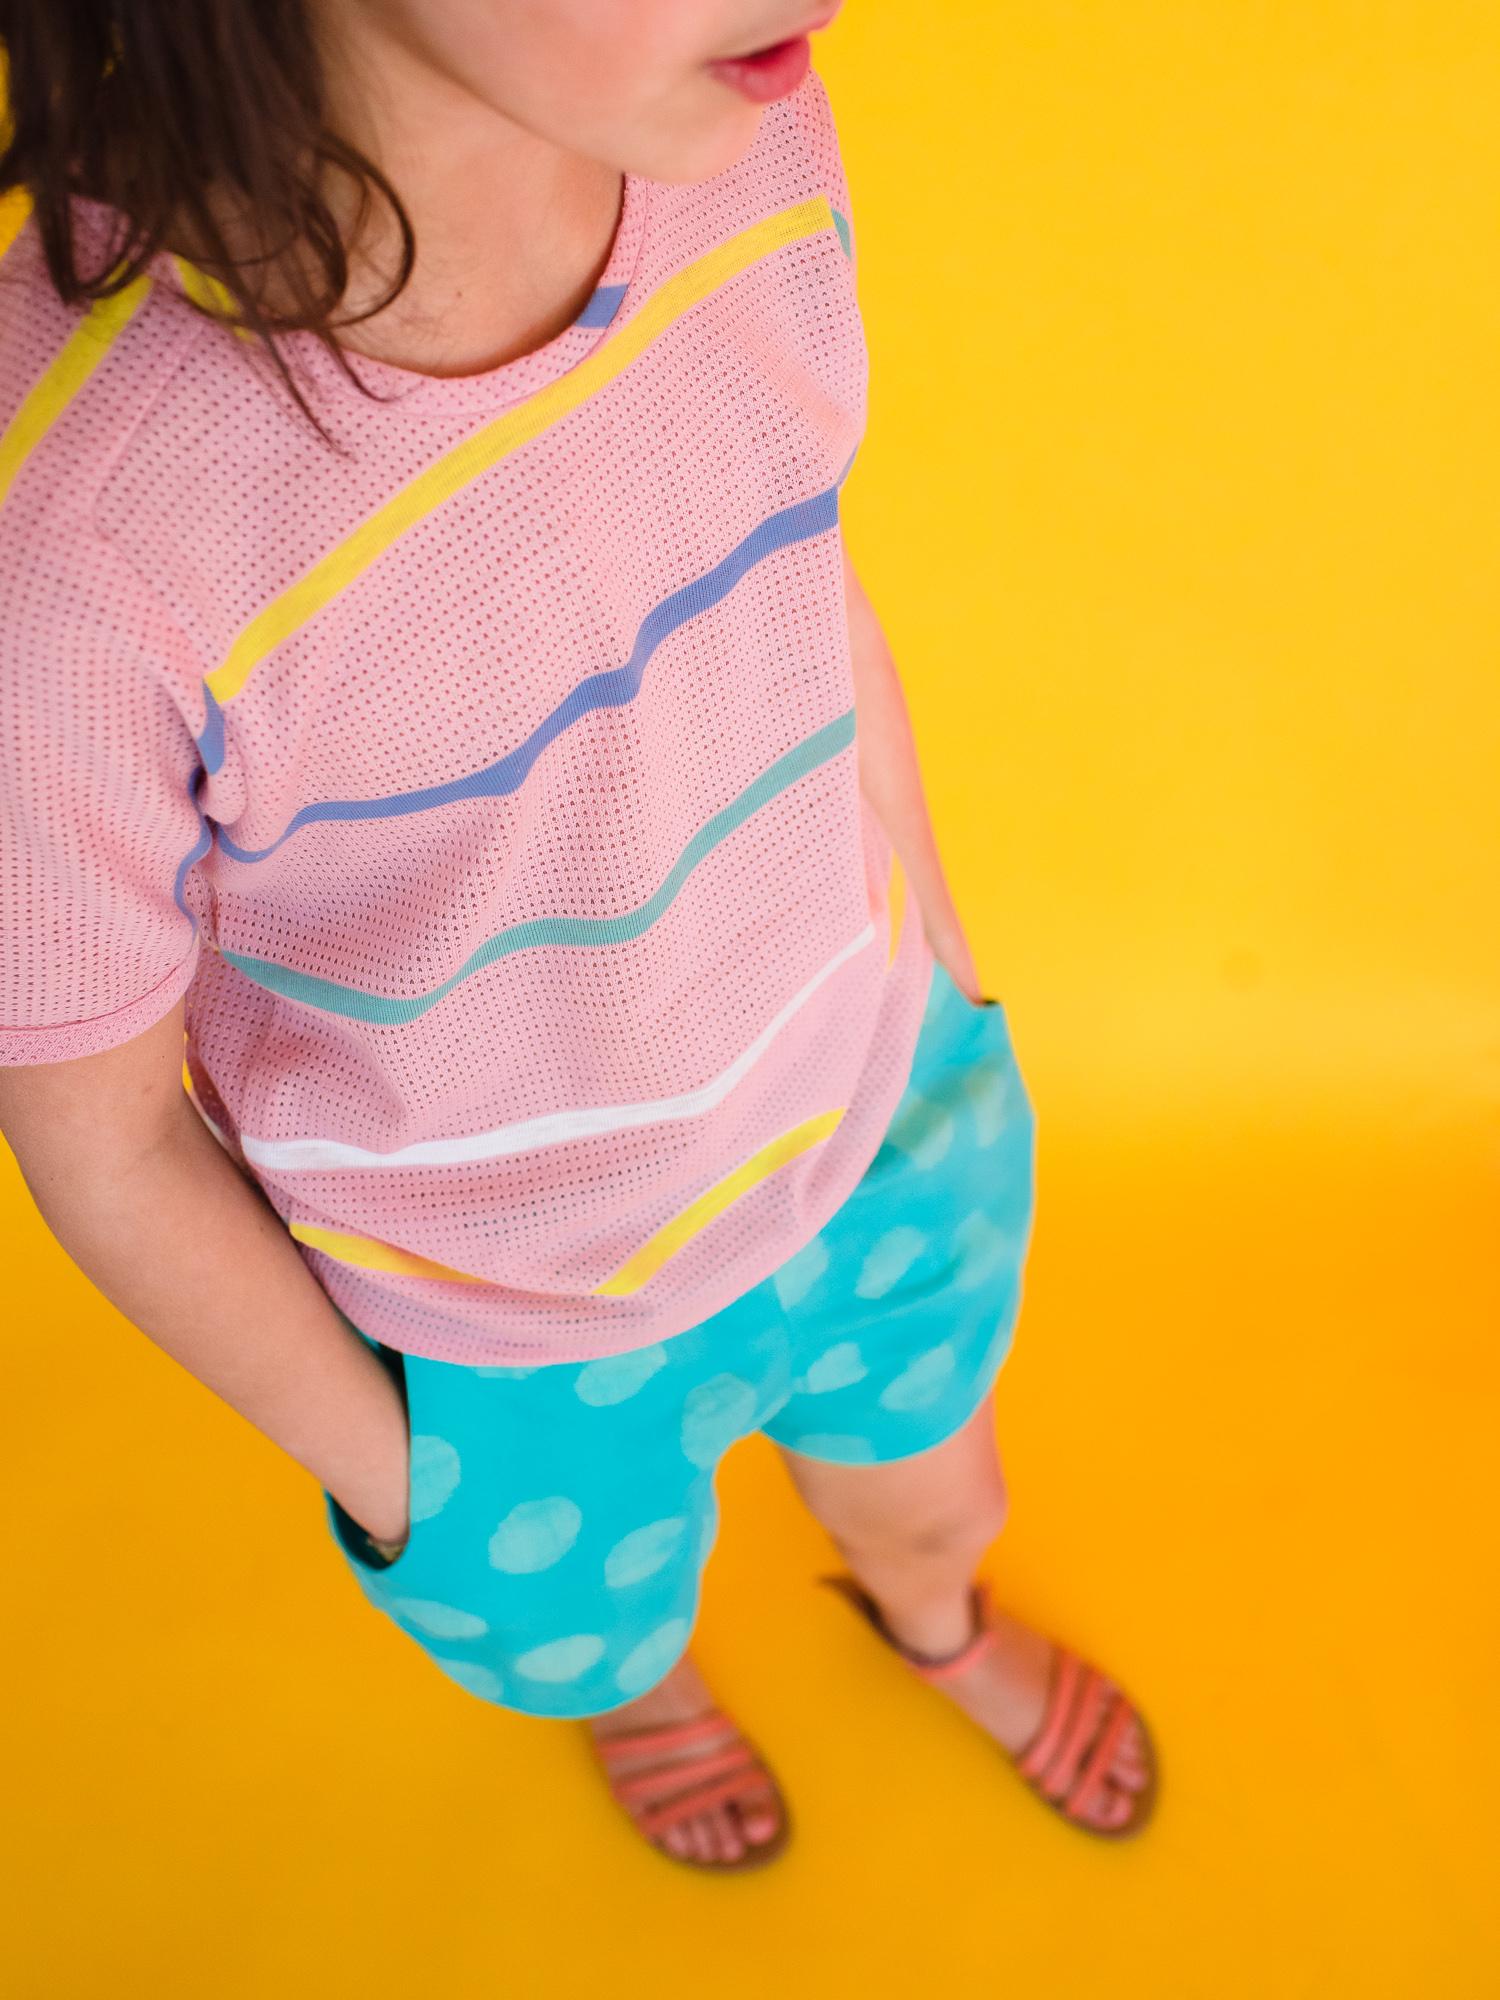 prp-kids-sewing-patterns128.jpg